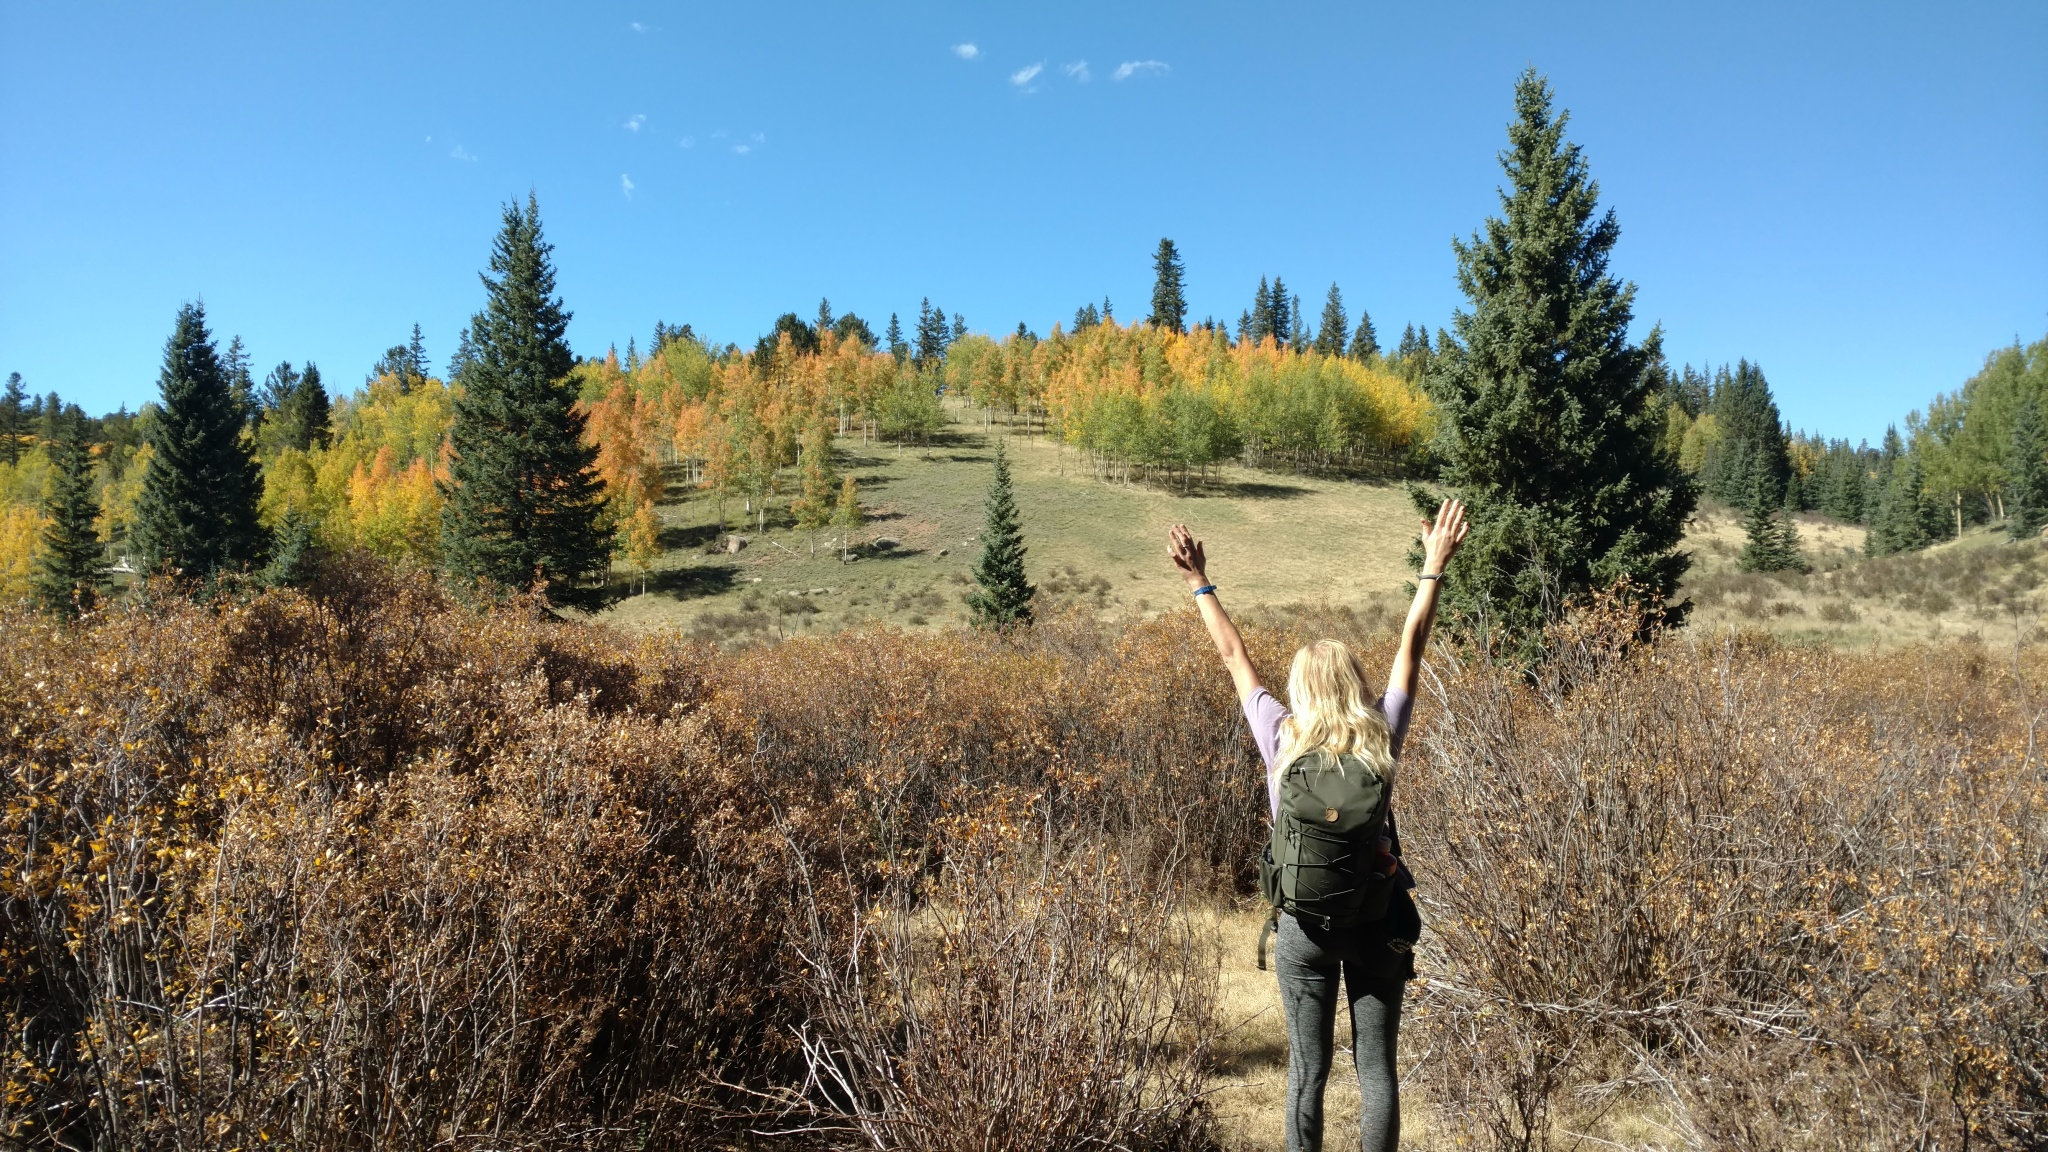 hiking, pancake rocks, colorado, fall colors, mountains, friends